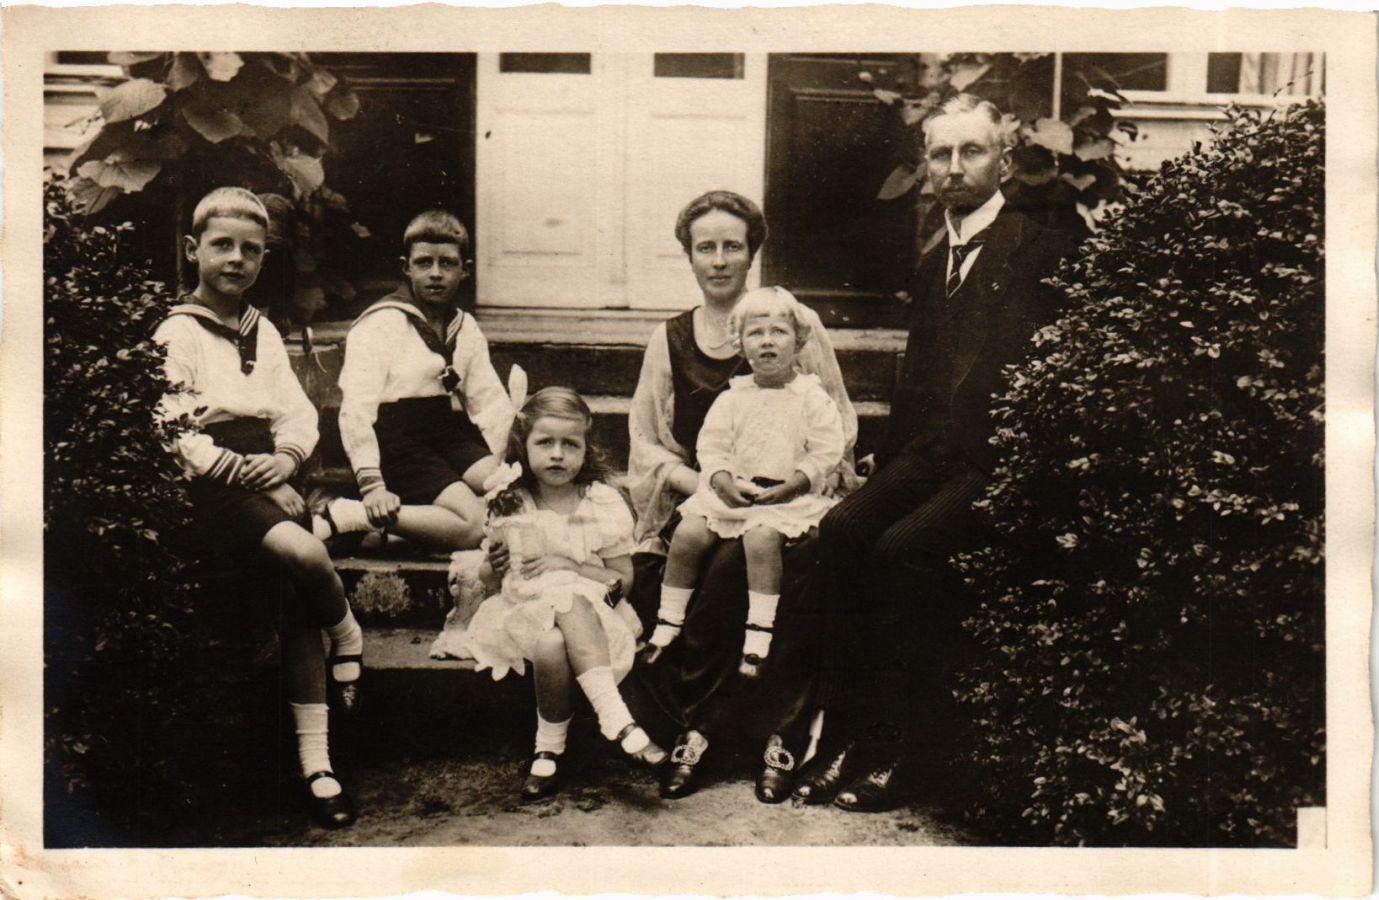 CPA-AK-Prinzenpaares-Oskar-v-Preussen-Familie-GERMAN-ROYALTY-867965